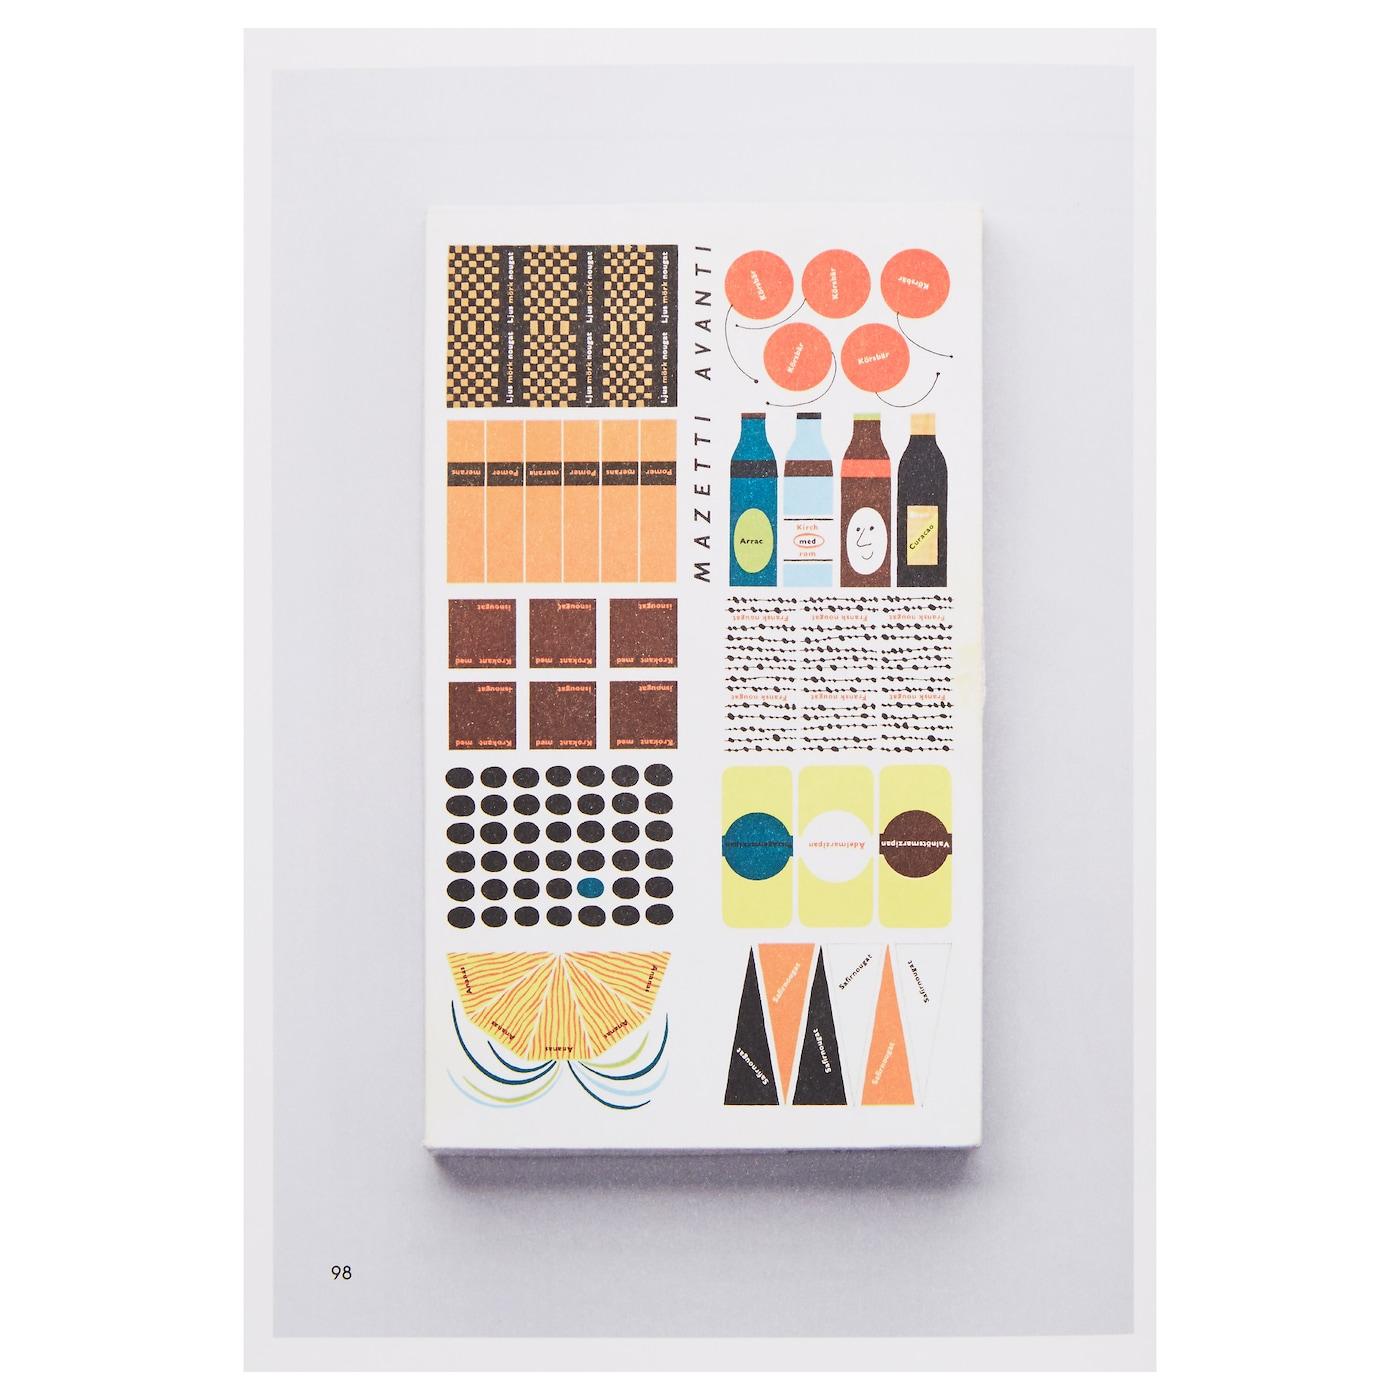 olle eksell of course boek ikea. Black Bedroom Furniture Sets. Home Design Ideas